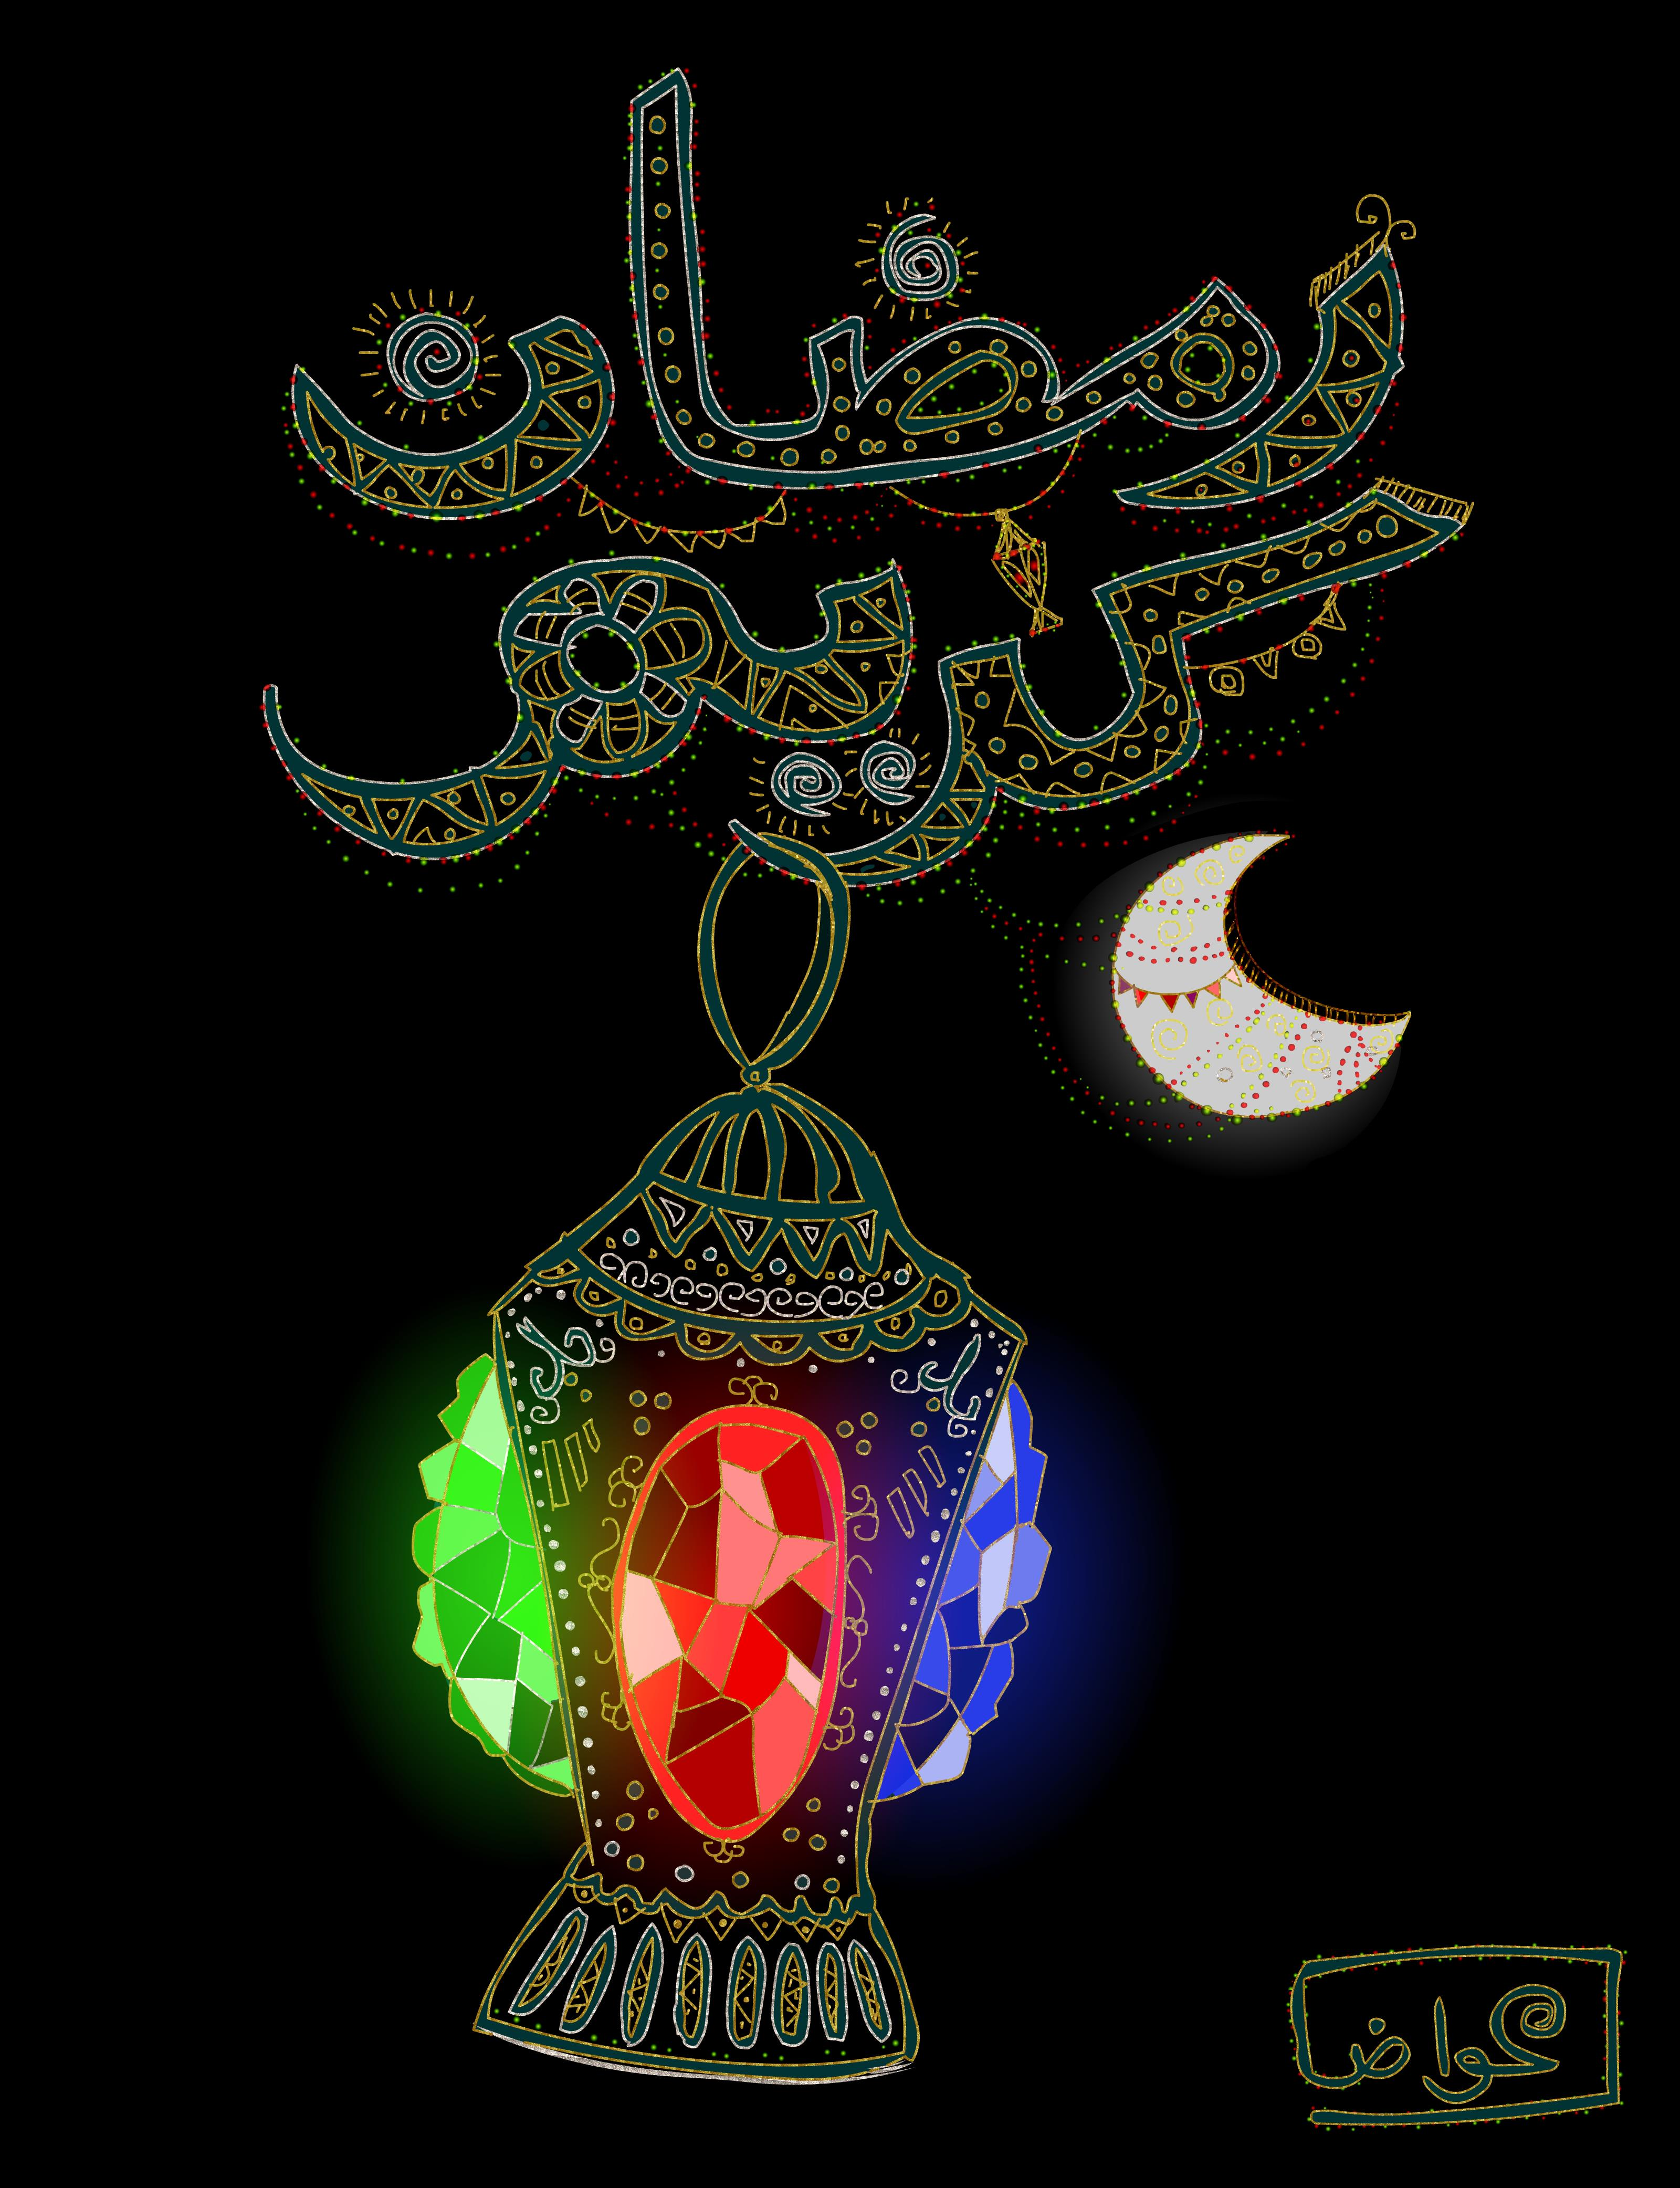 Ramadan Kareem with Lantern and Crescent - Drawings